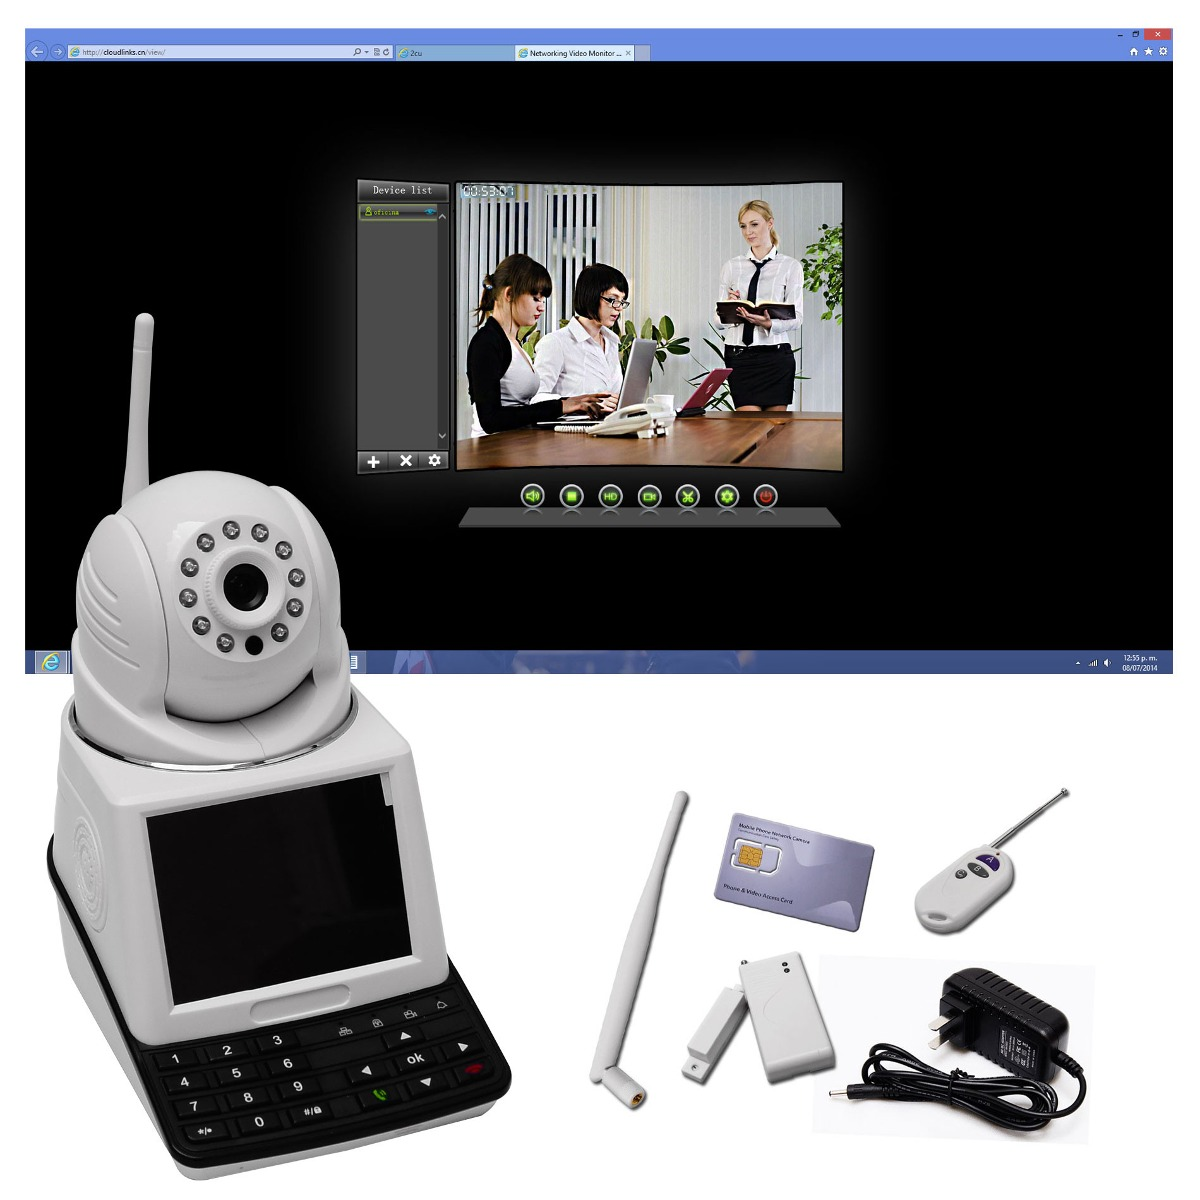 Camara de seguridad ip videollamada monitoreo con sim - Camara de seguridad ip ...